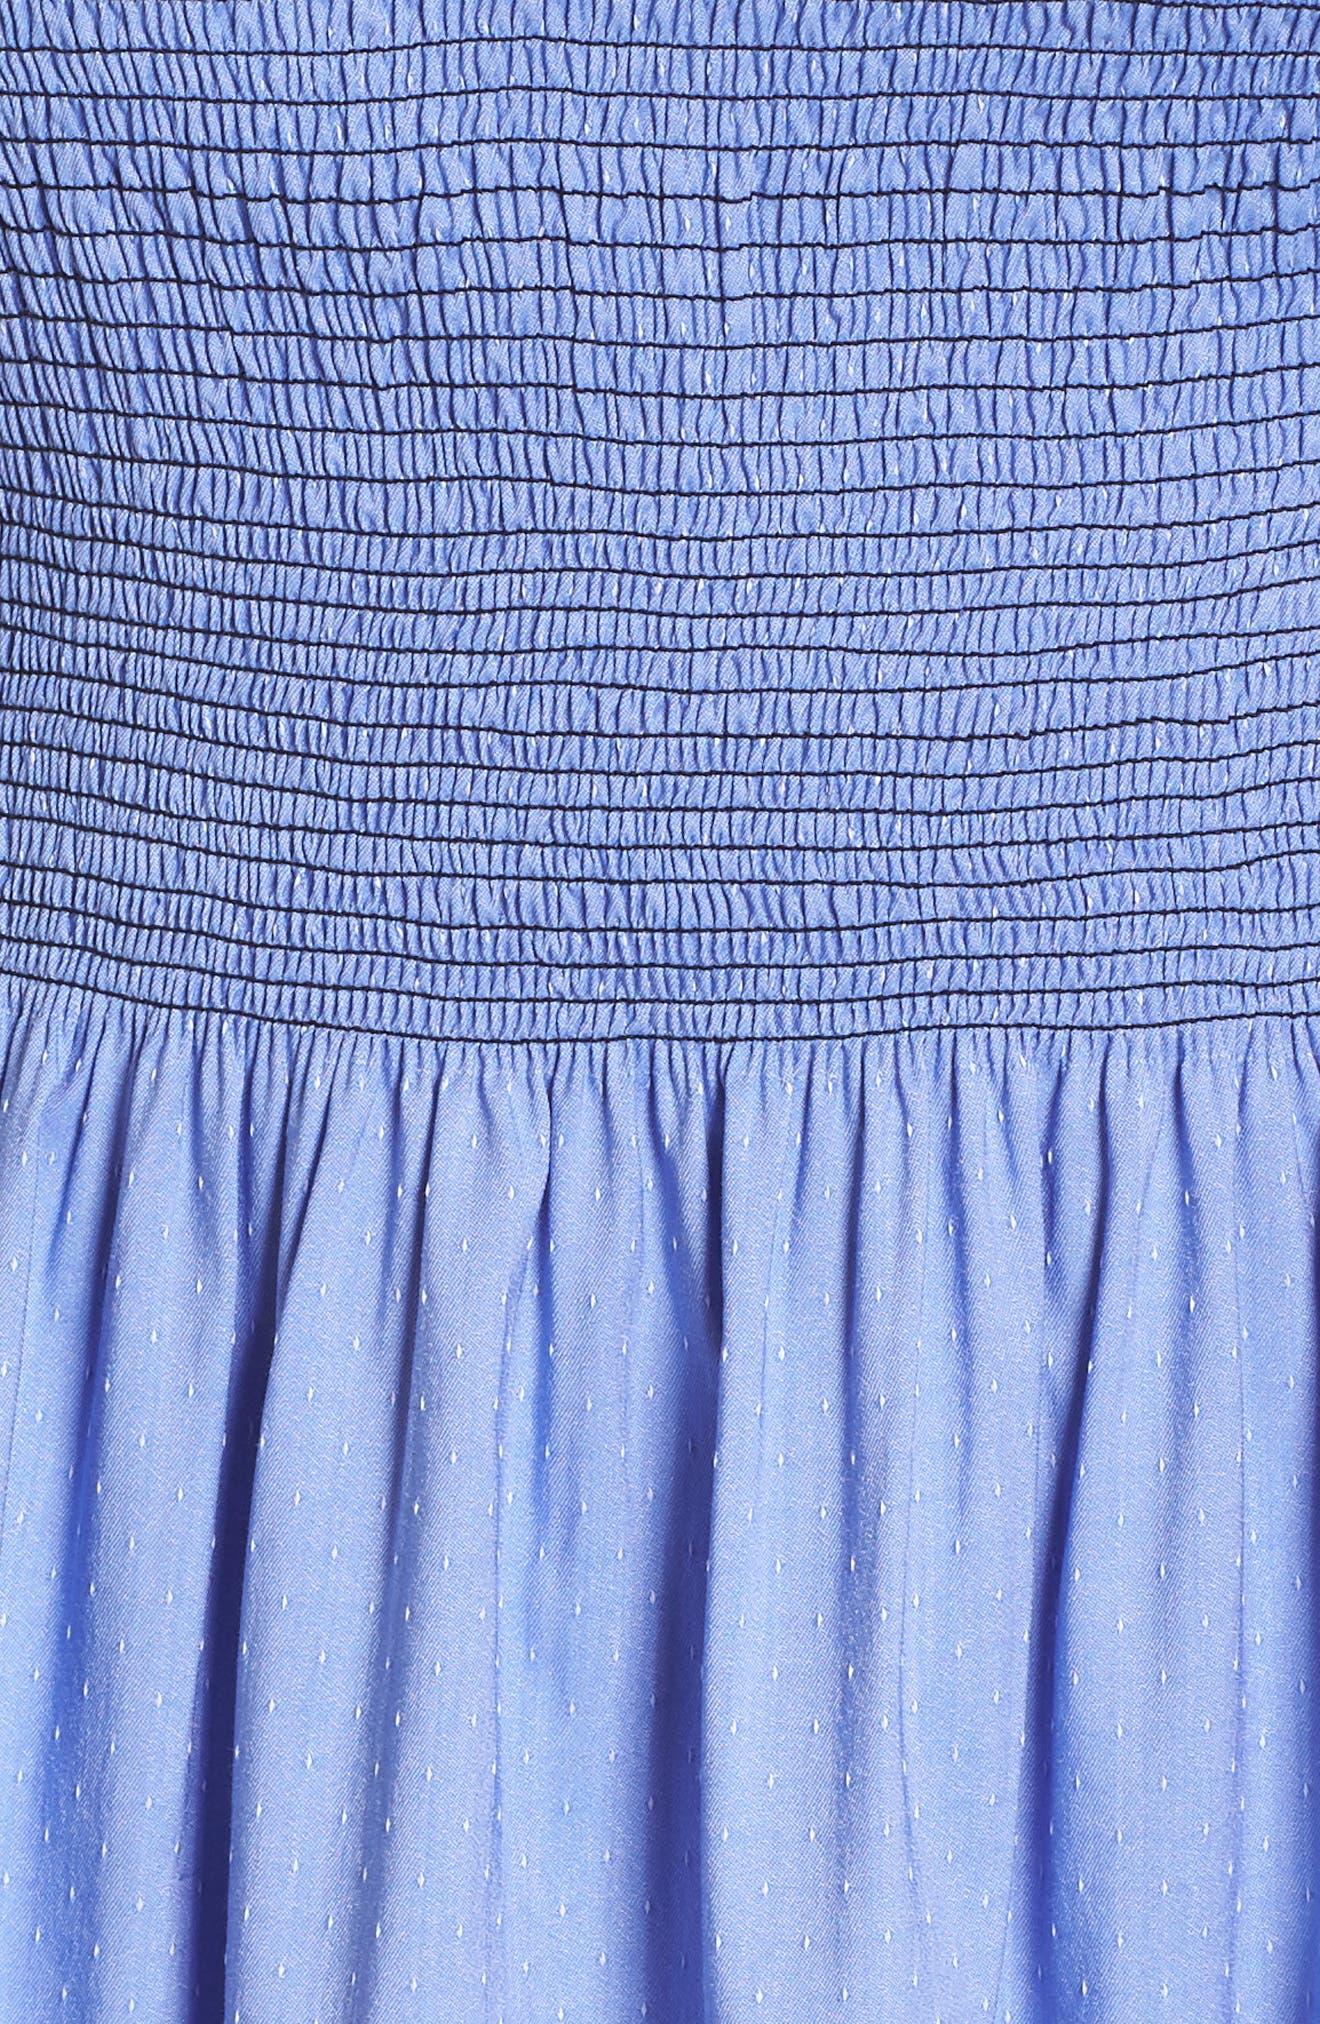 Off the Shoulder Smocked Bodice Midi Dress,                             Alternate thumbnail 6, color,                             Blue Ivory Swiss Dot